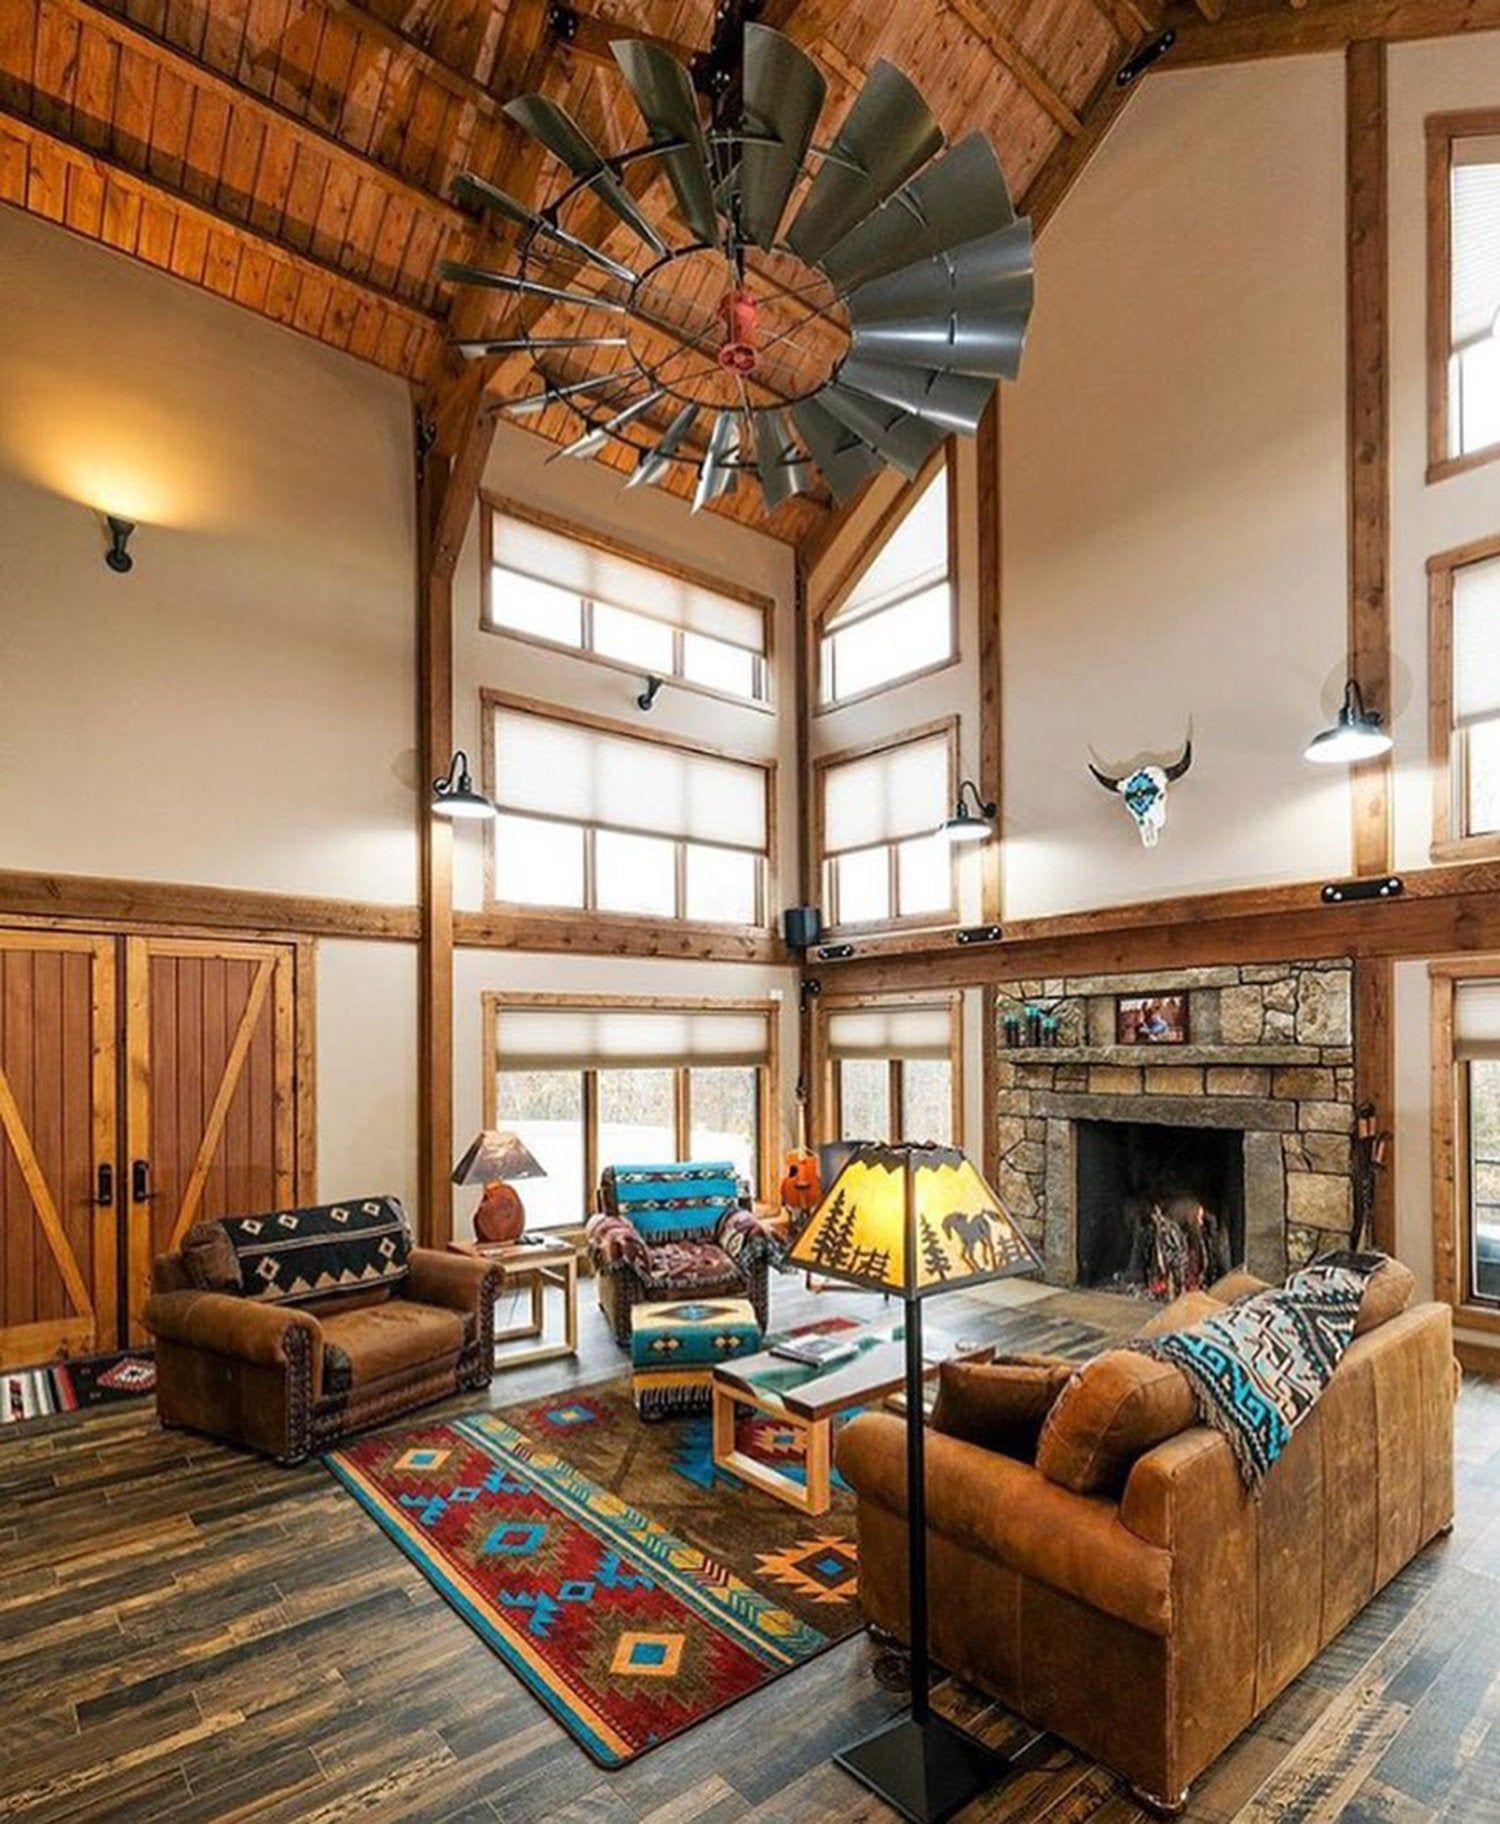 Native American Style Rug Native American Style Area Rug